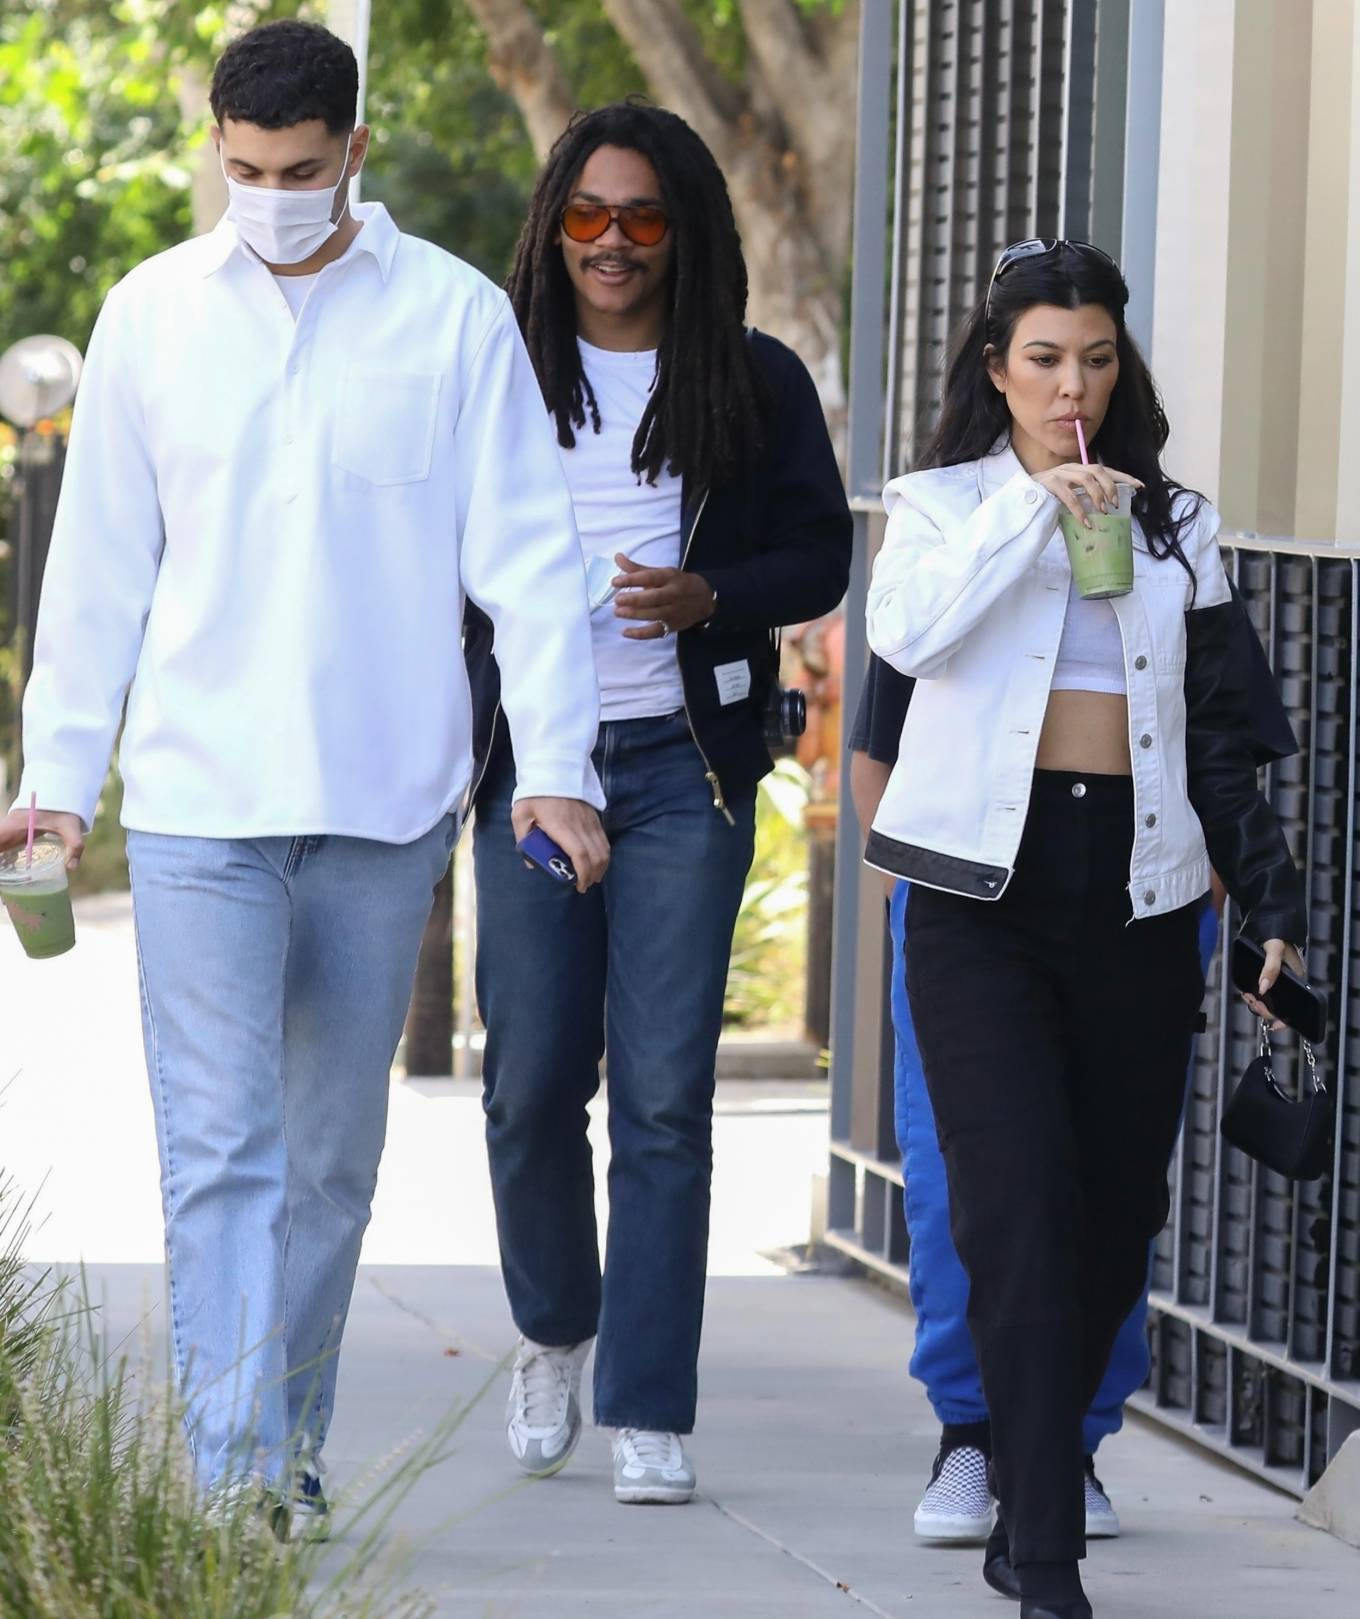 Kourtney Kardashian 2021 : Kourtney Kardashian – Seen at Cha Cha Matcha in West Hollywood-12